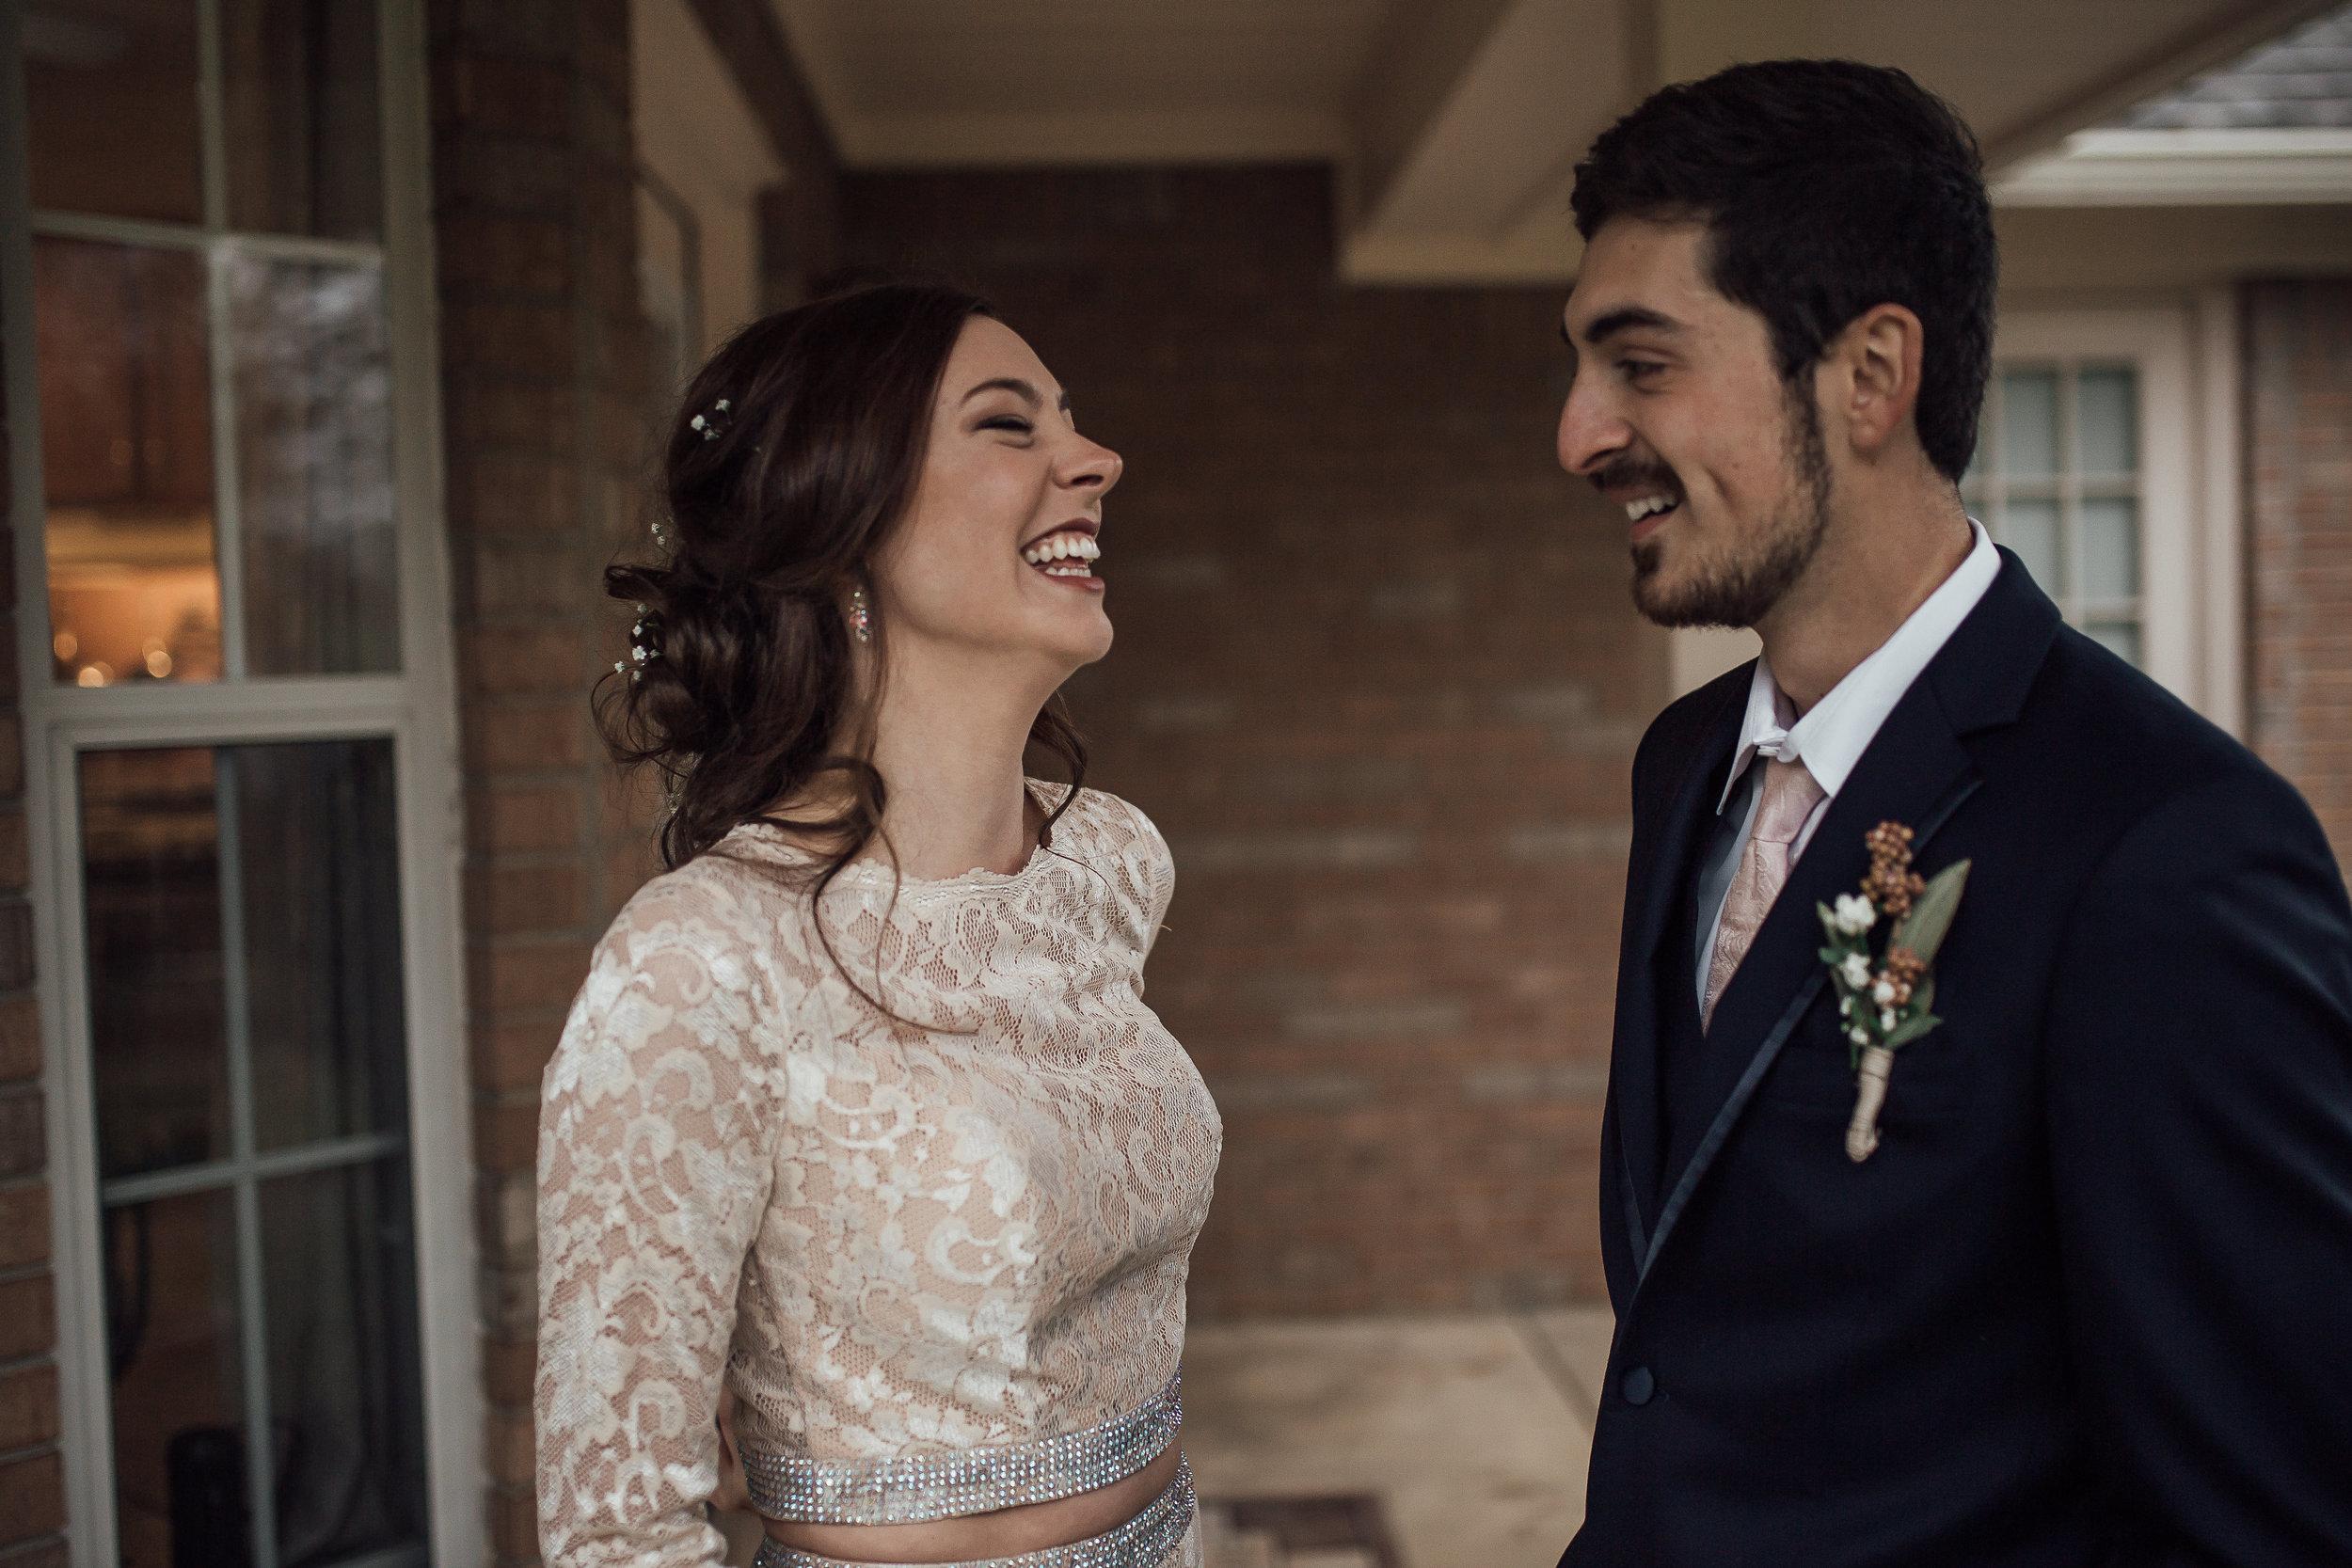 memphis-wedding-photographer-memphis-winter-wedding-cassie-cook-photography